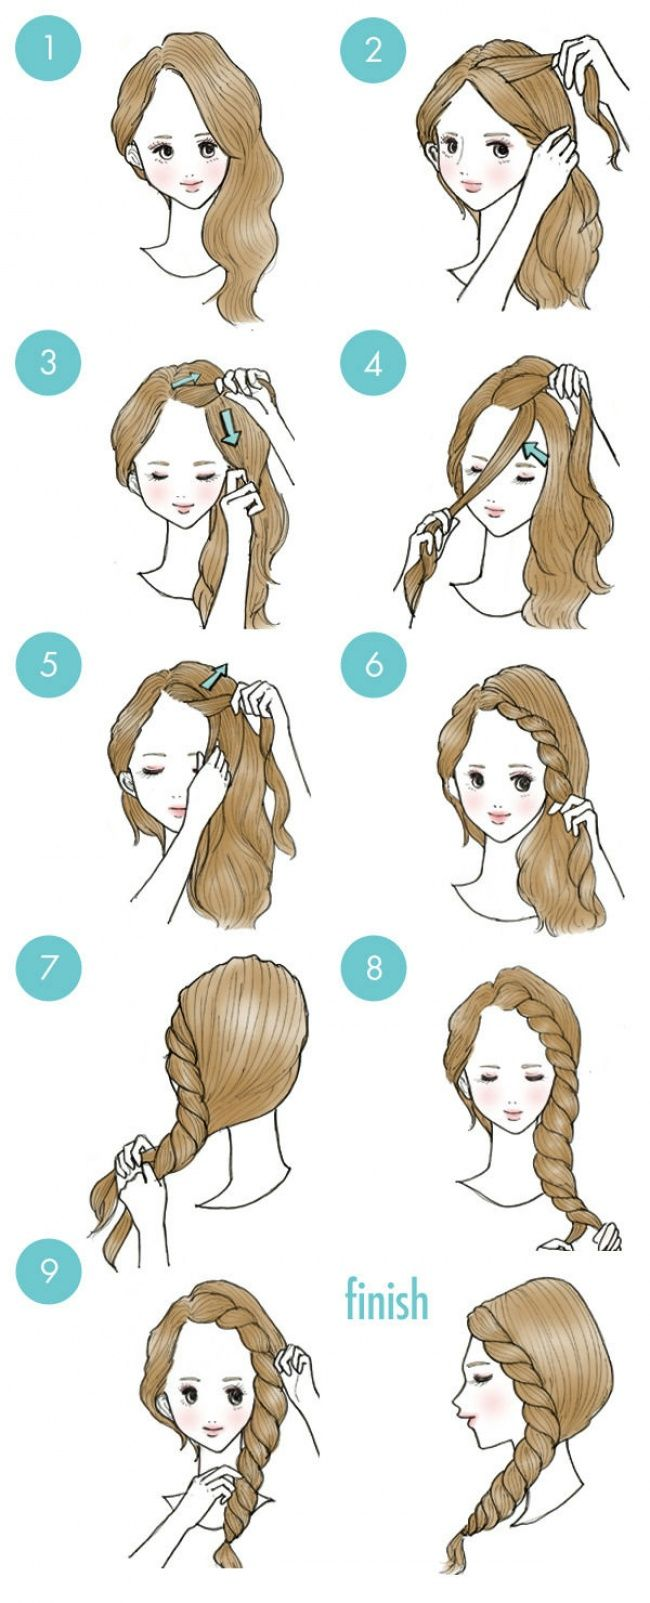 Прически с повязкой для волос на голове, на лбу 11